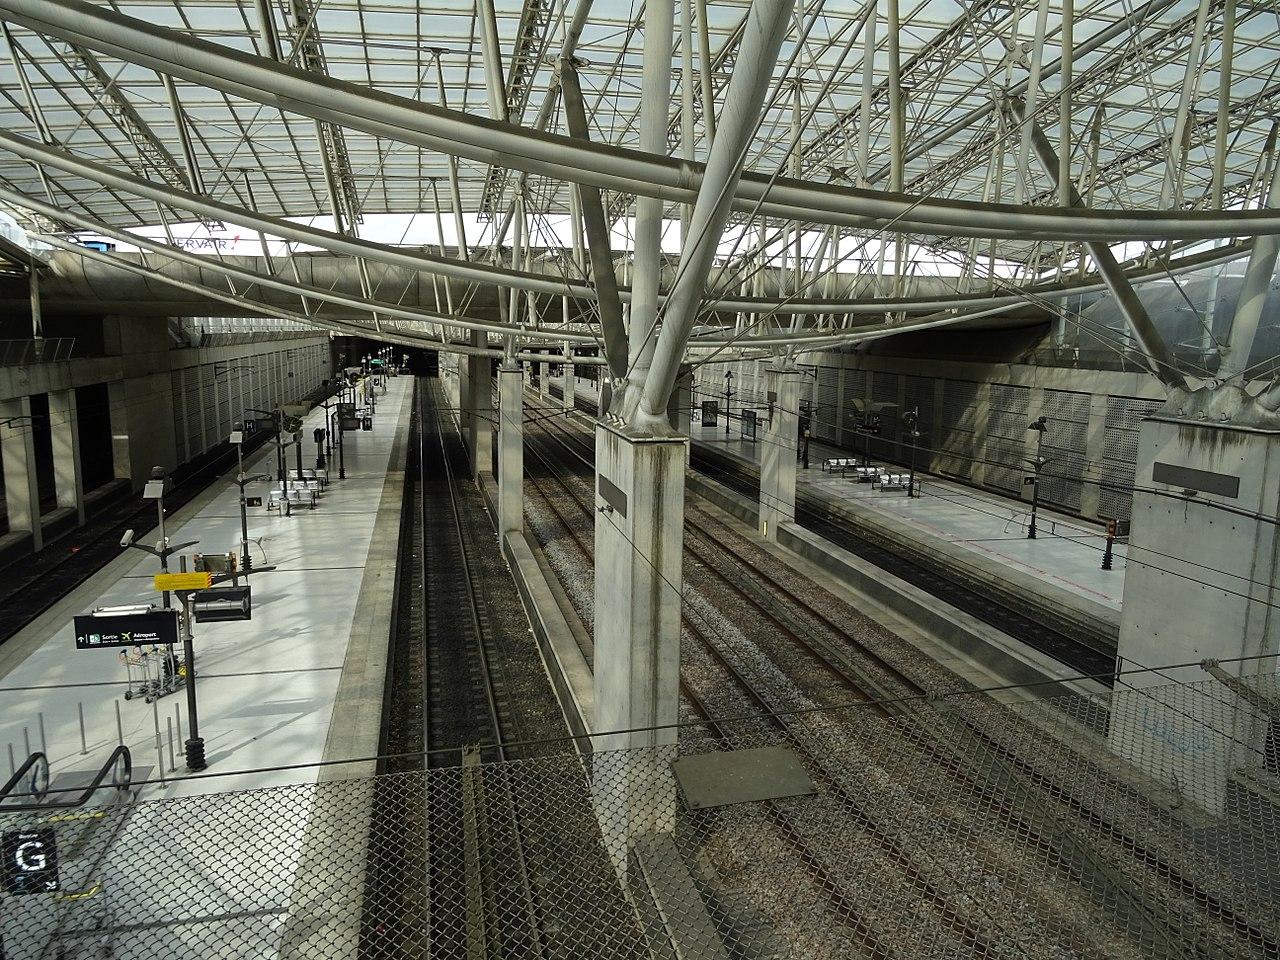 Paris-airport-cdg-2-tgv-rer-train-station